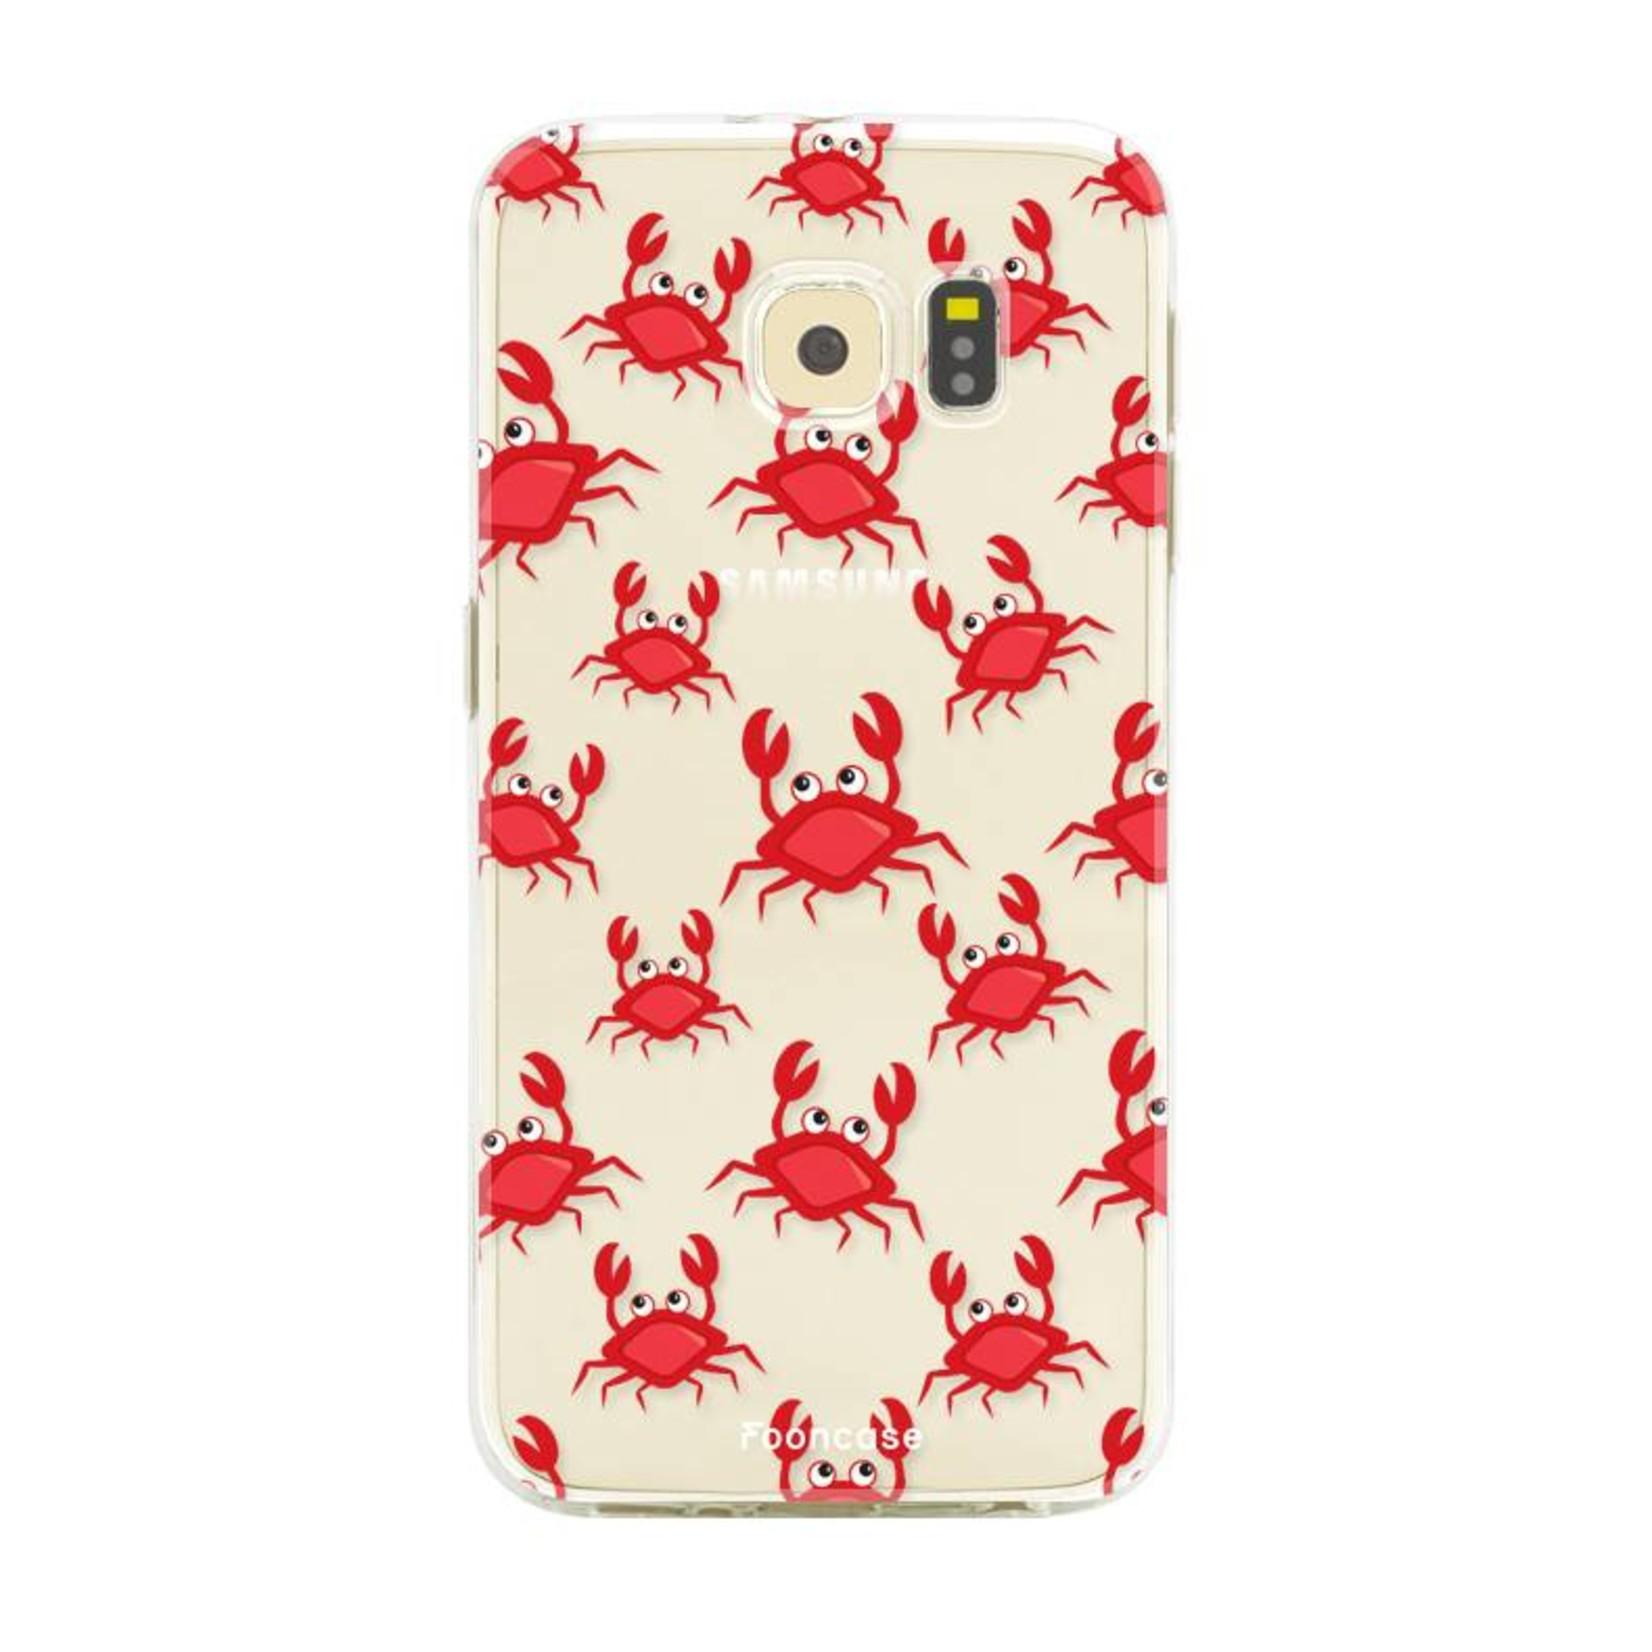 FOONCASE Samsung Galaxy S6 Edge hoesje TPU Soft Case - Back Cover - Crabs / Krabbetjes / Krabben